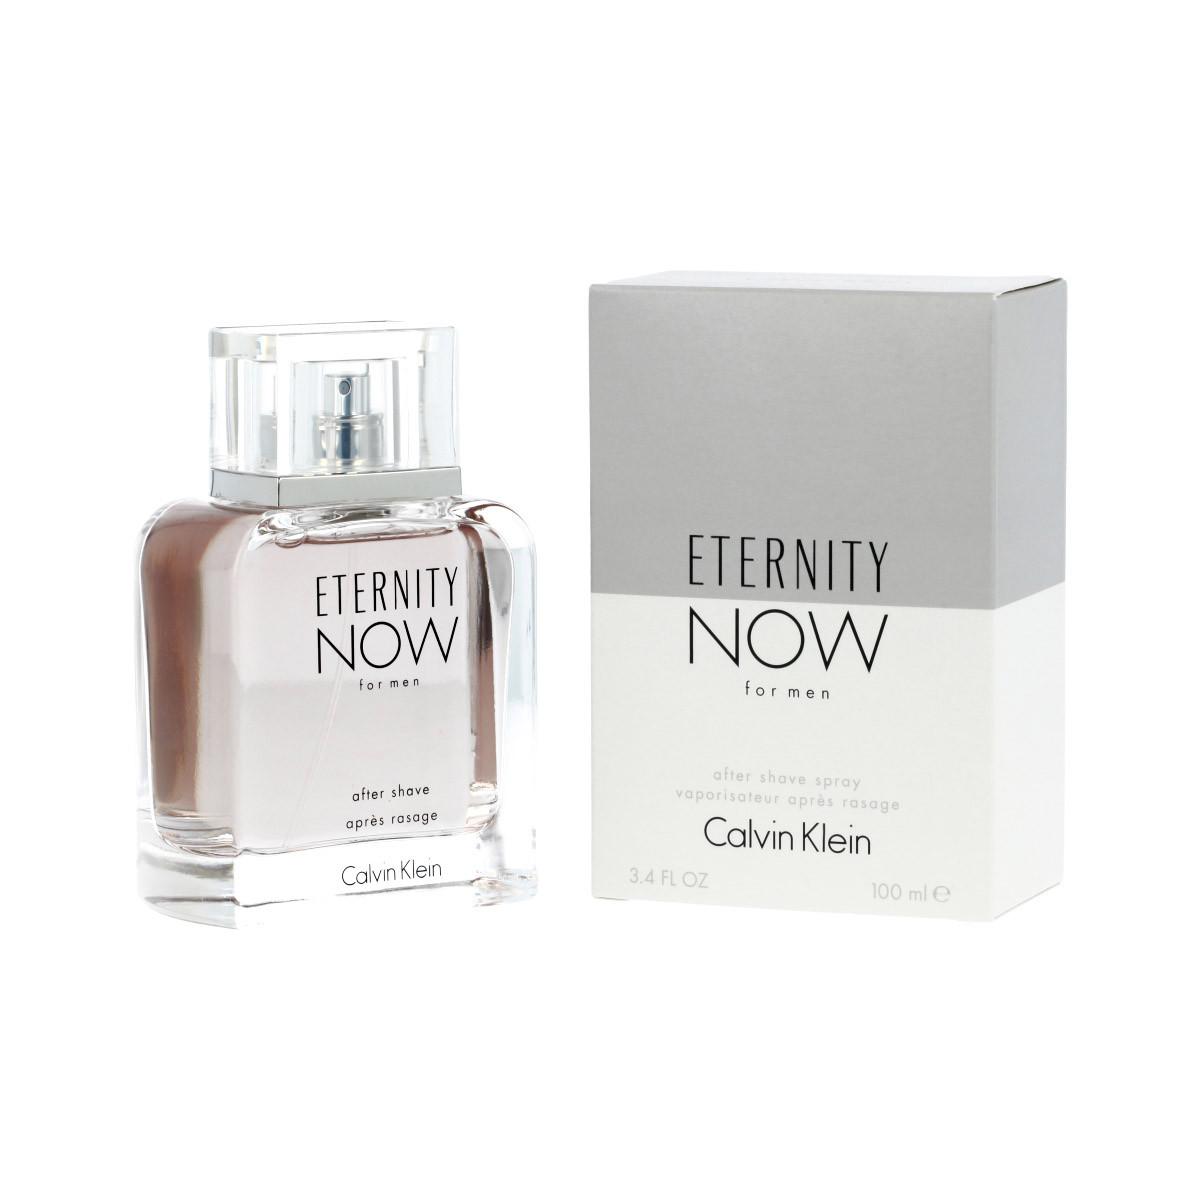 1c3351540f Calvin Klein Eternity Now for Men AS 100 ml M - Eternity Now for Men ...